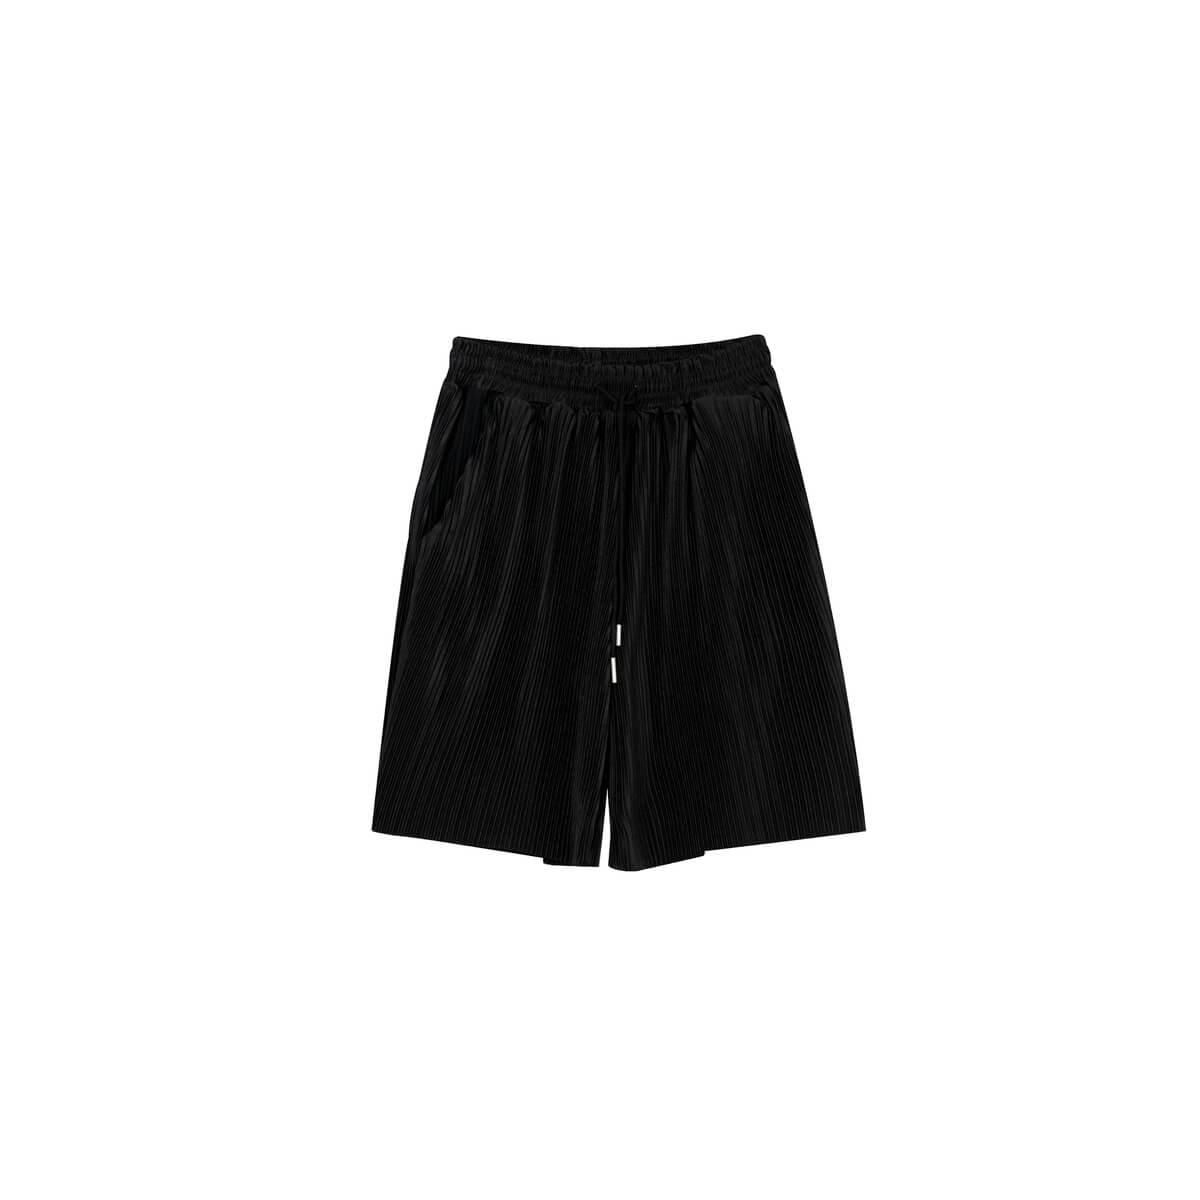 Шорты Cui Layout Studio Minimalist Vertical Striped Shorts Black